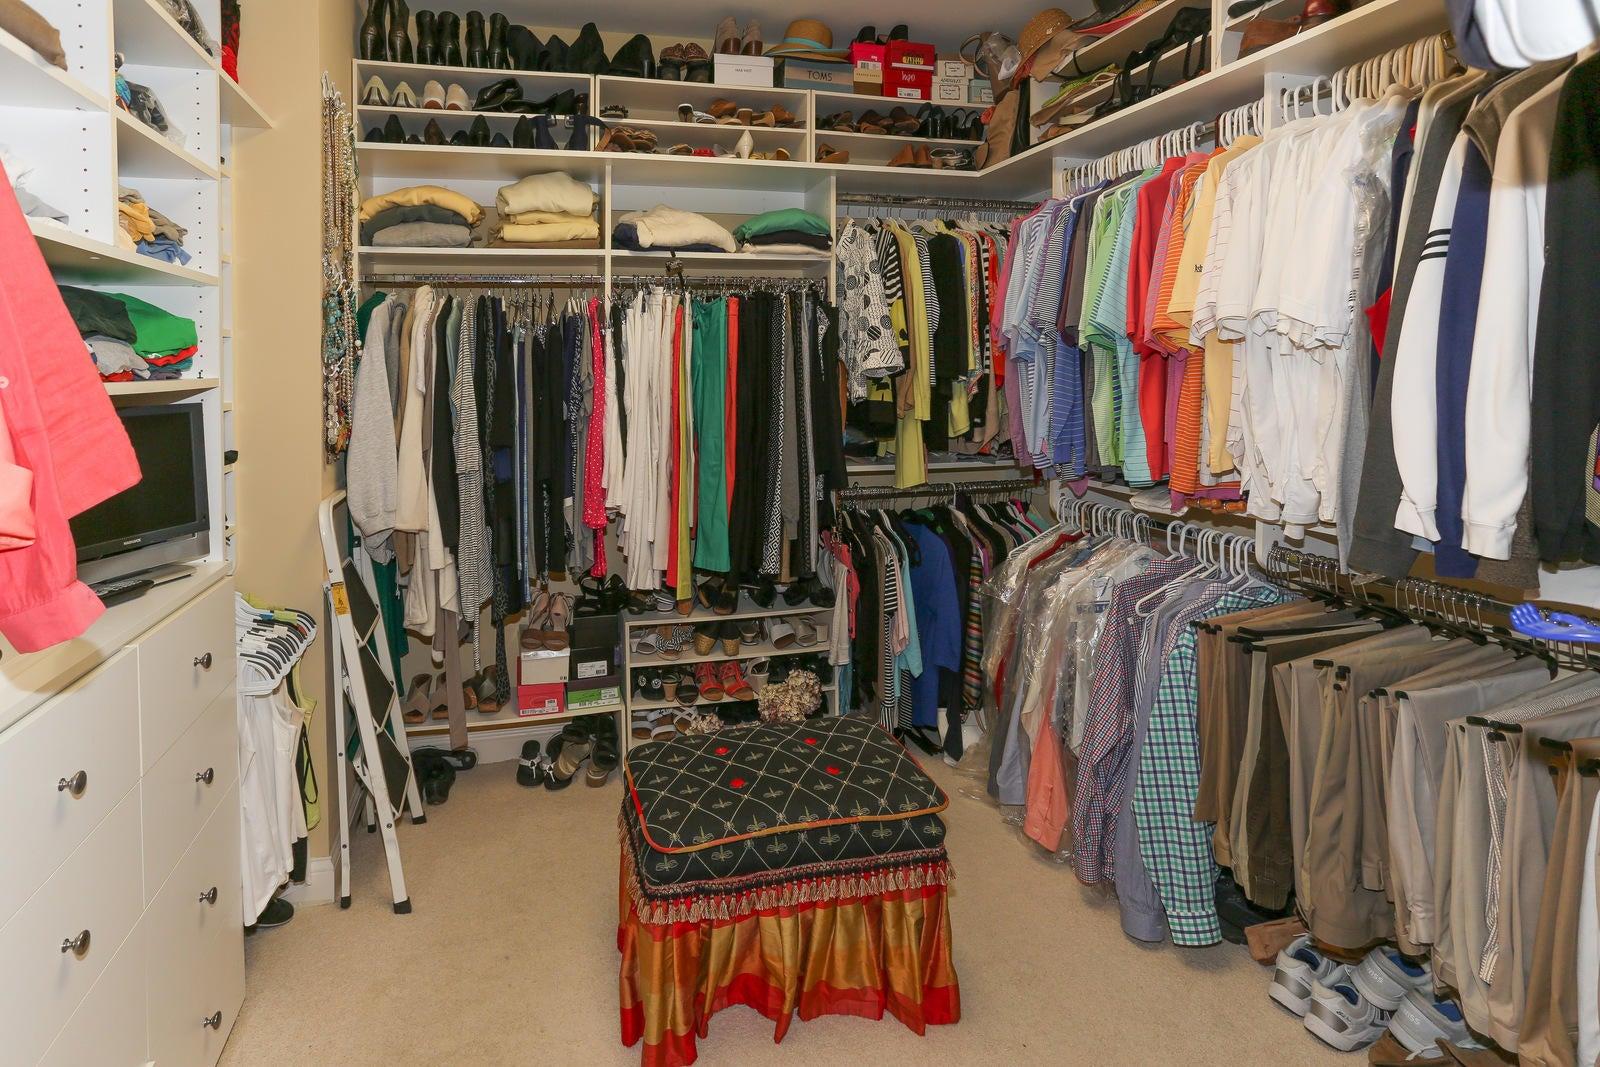 MBR walk in closet